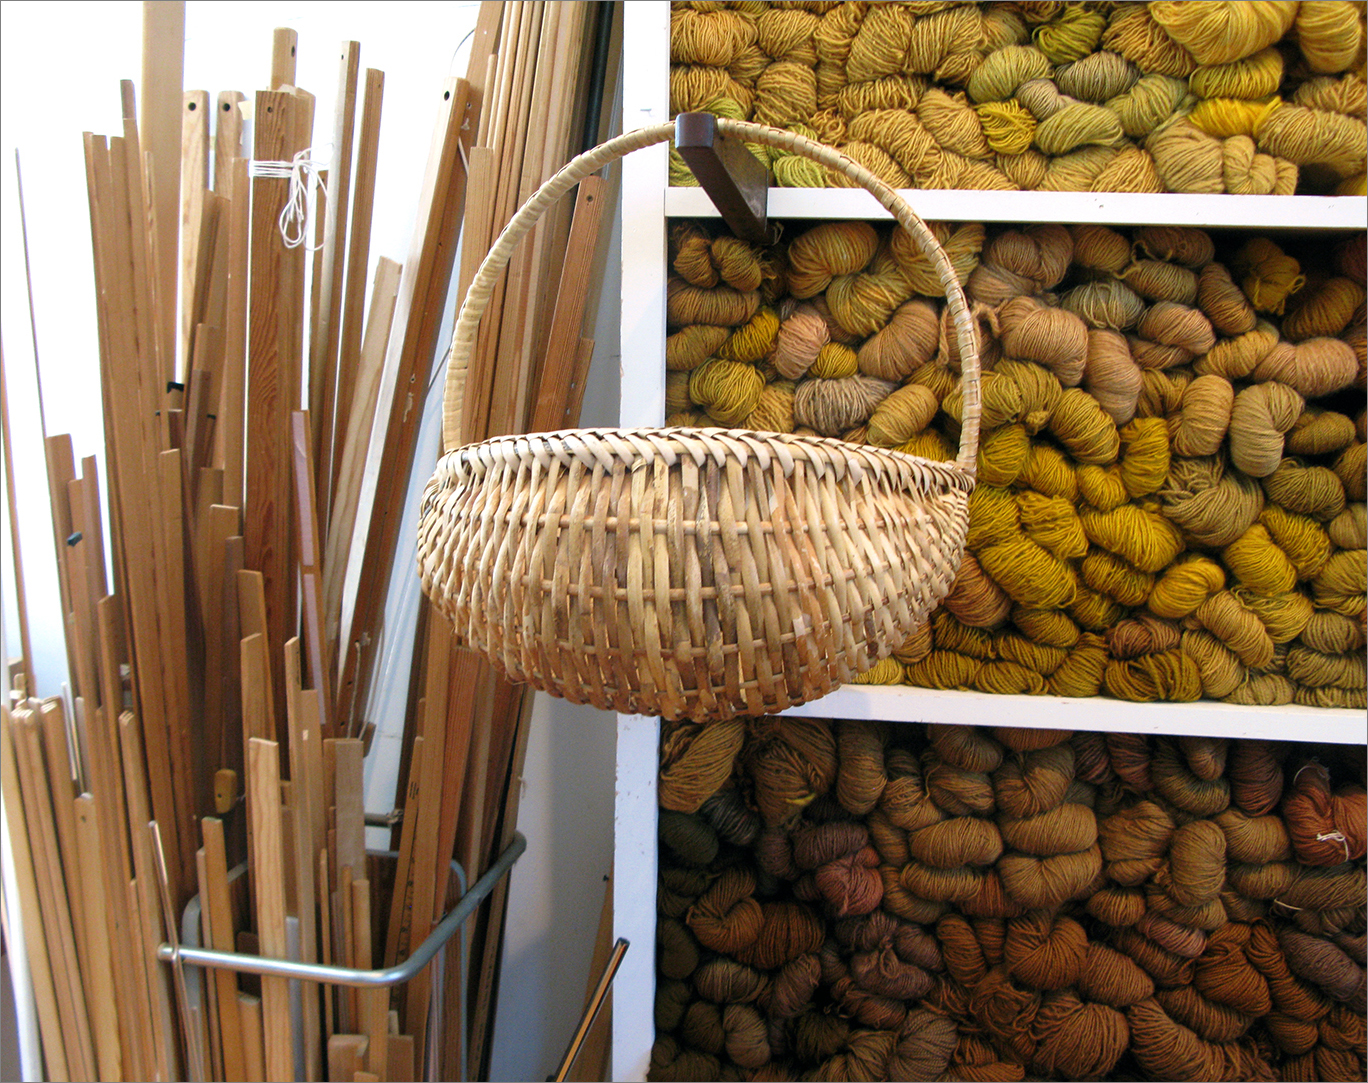 hernmarck - yellow wall with basket